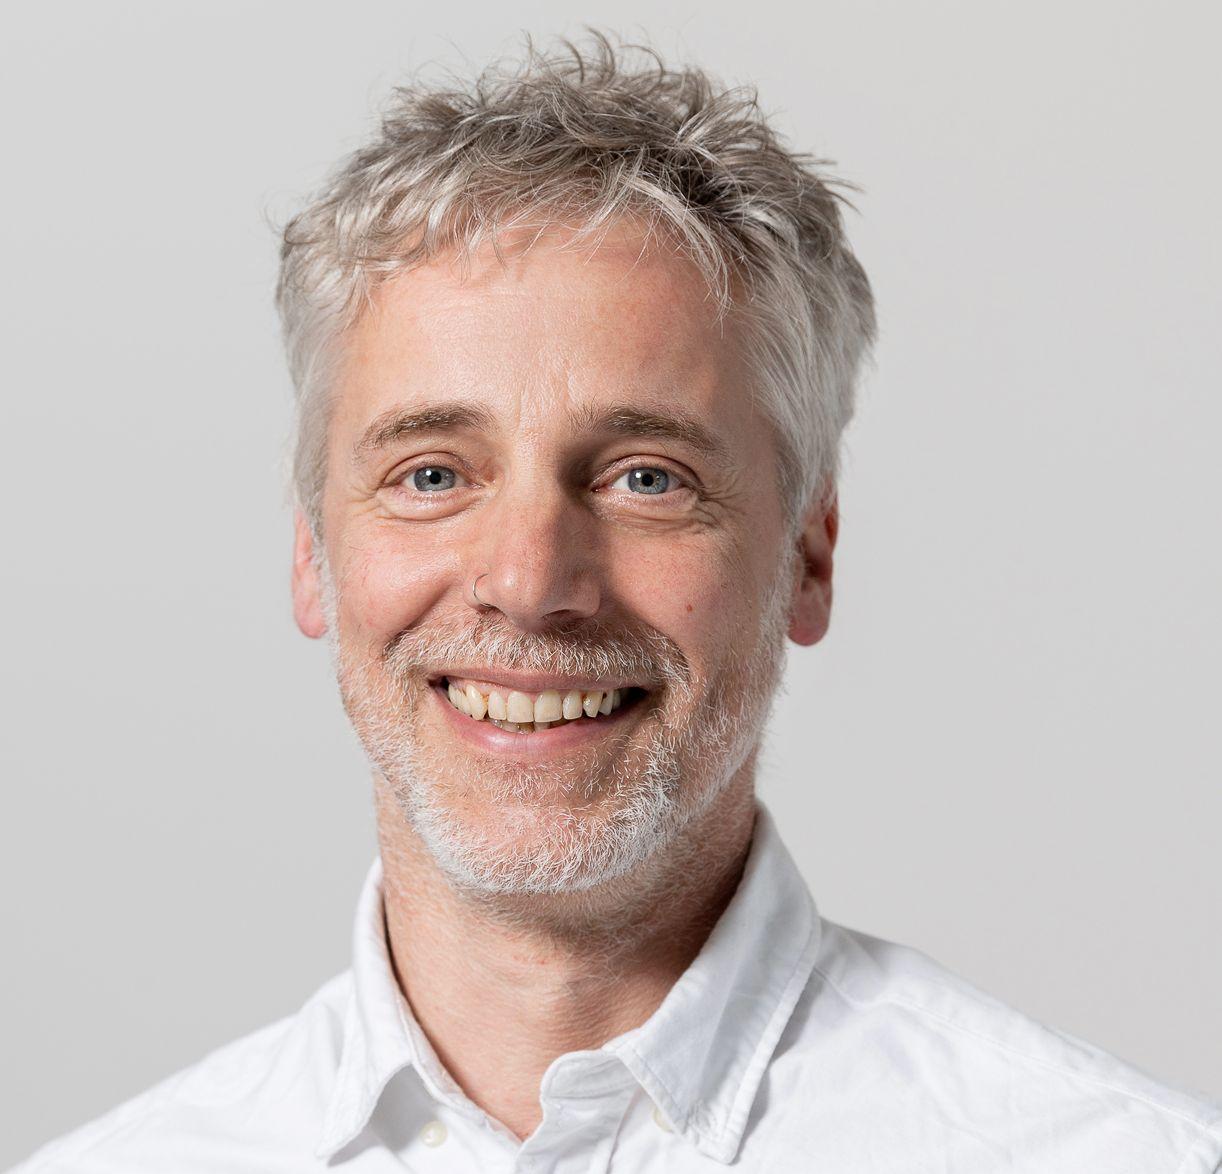 Prof. Thorsten Hornemann